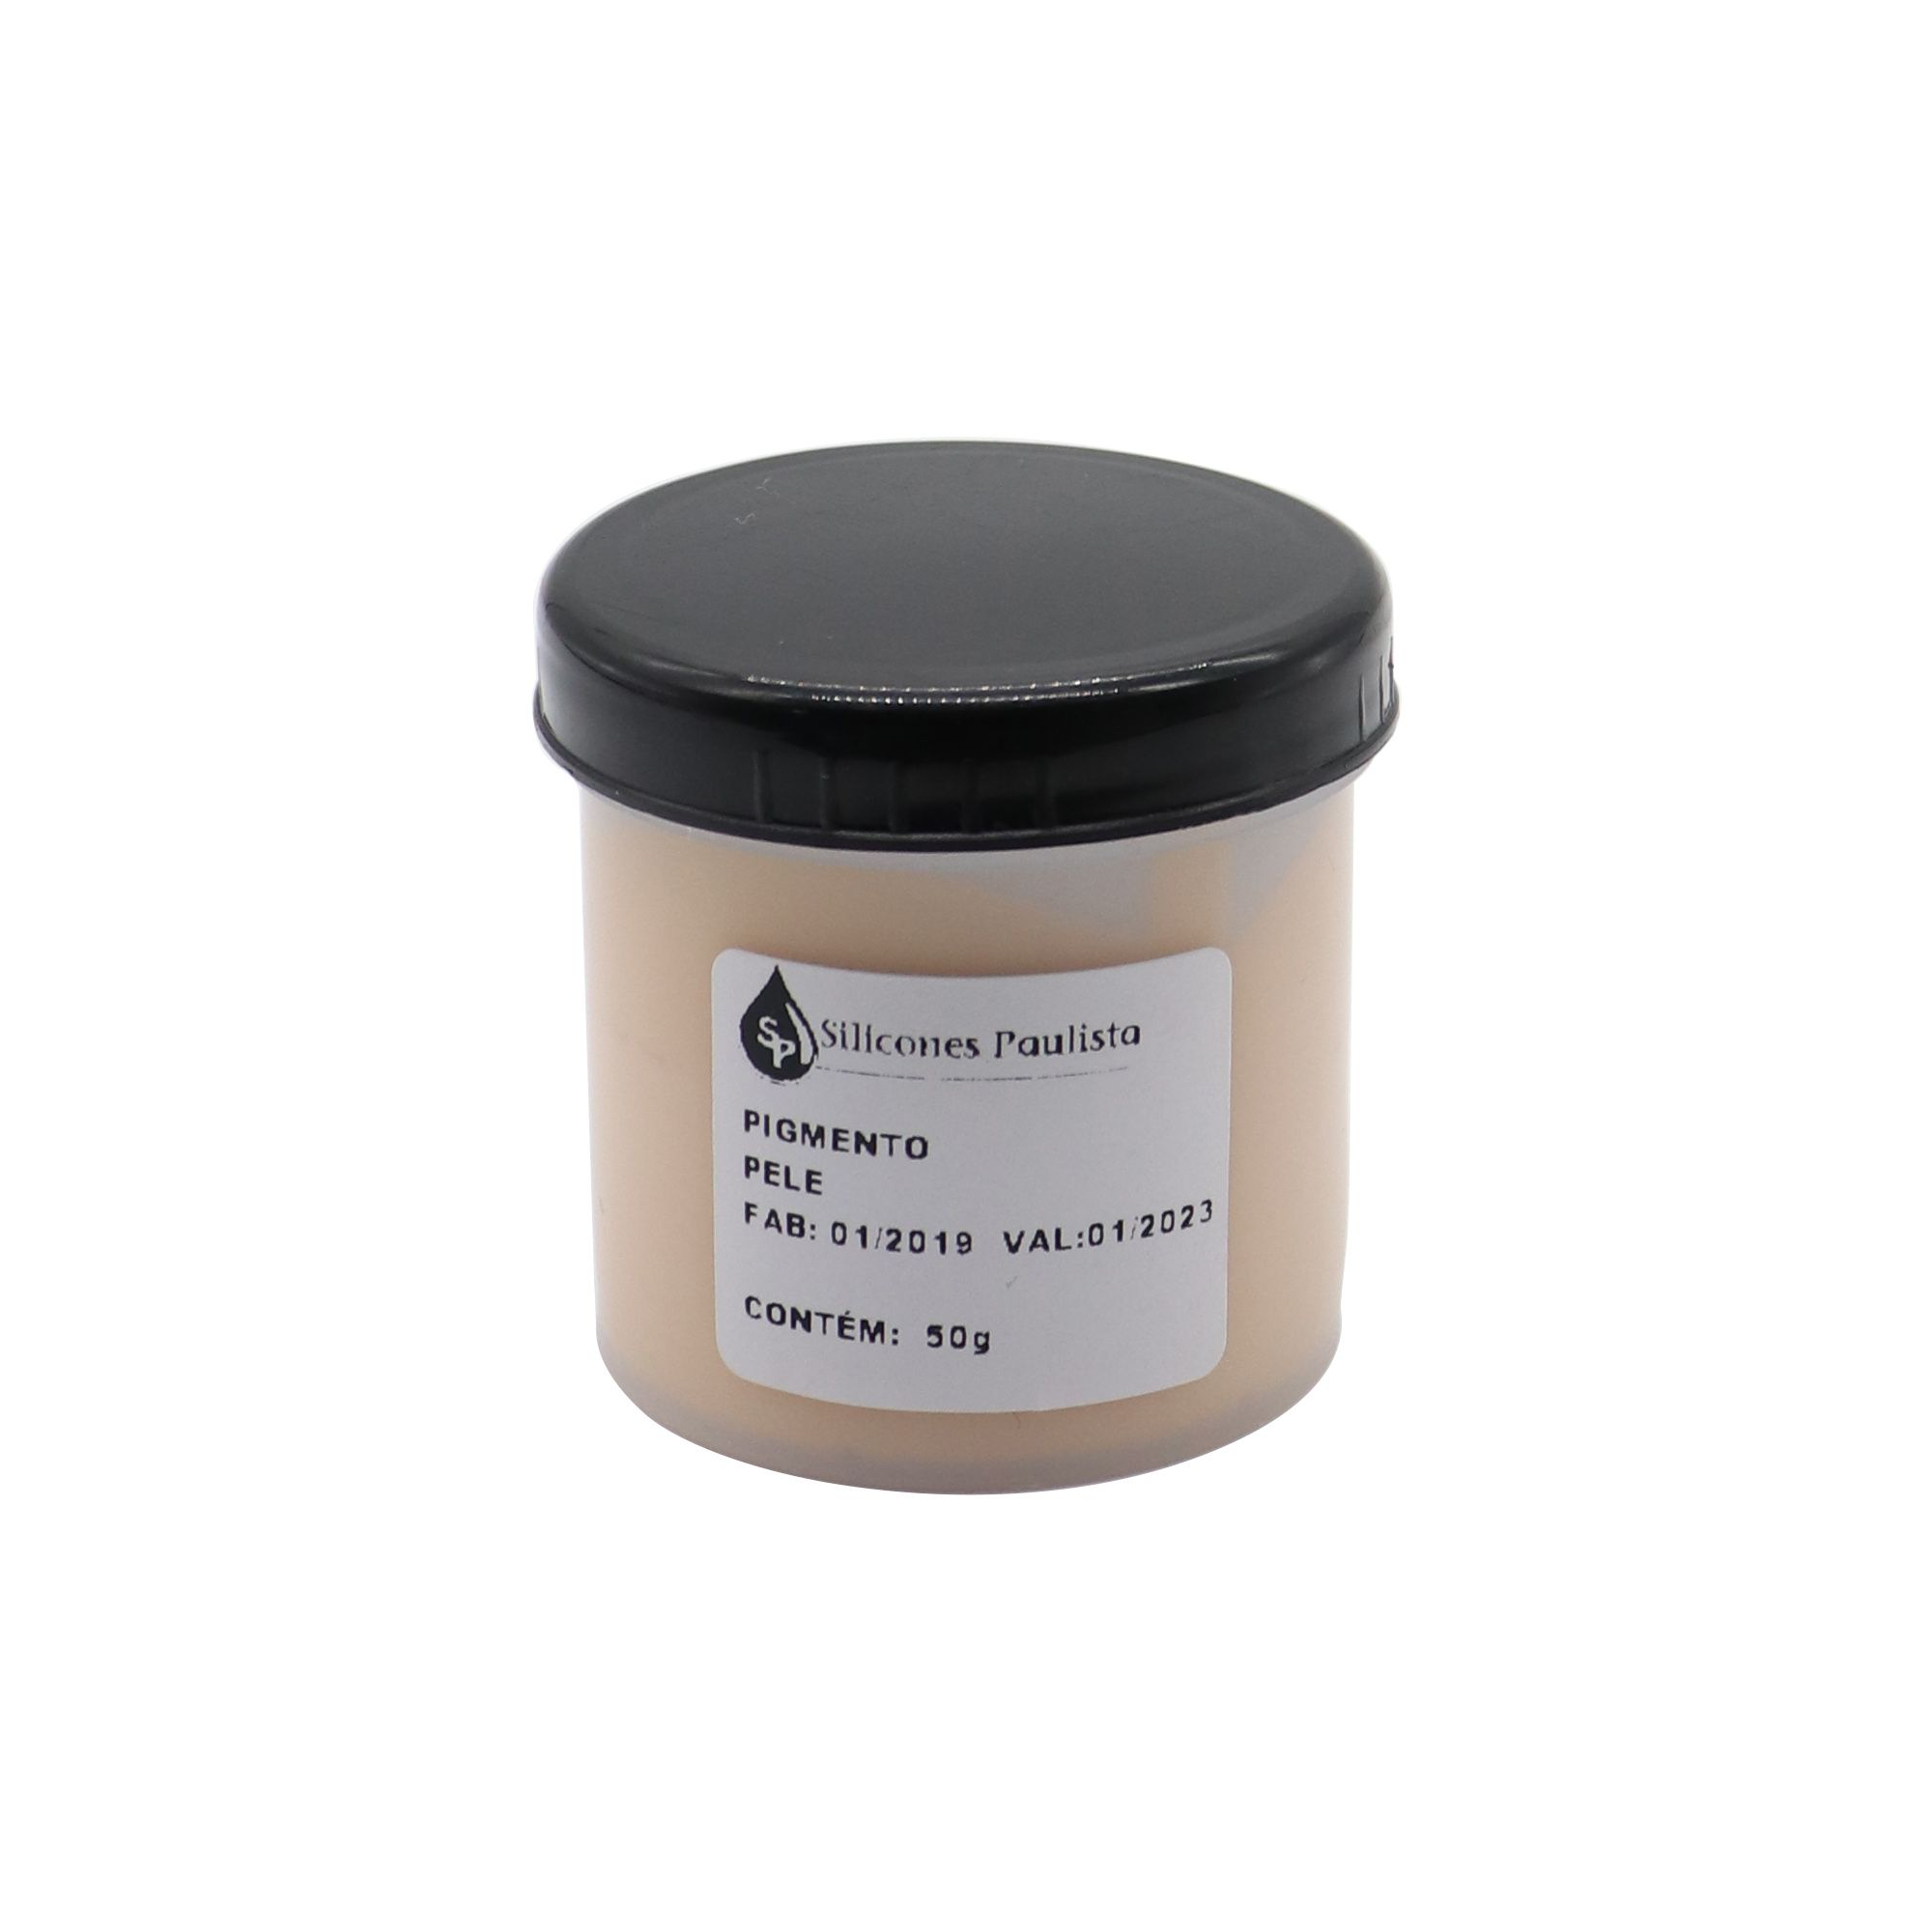 Pigmento pra Resina e Borracha 50g - Pele